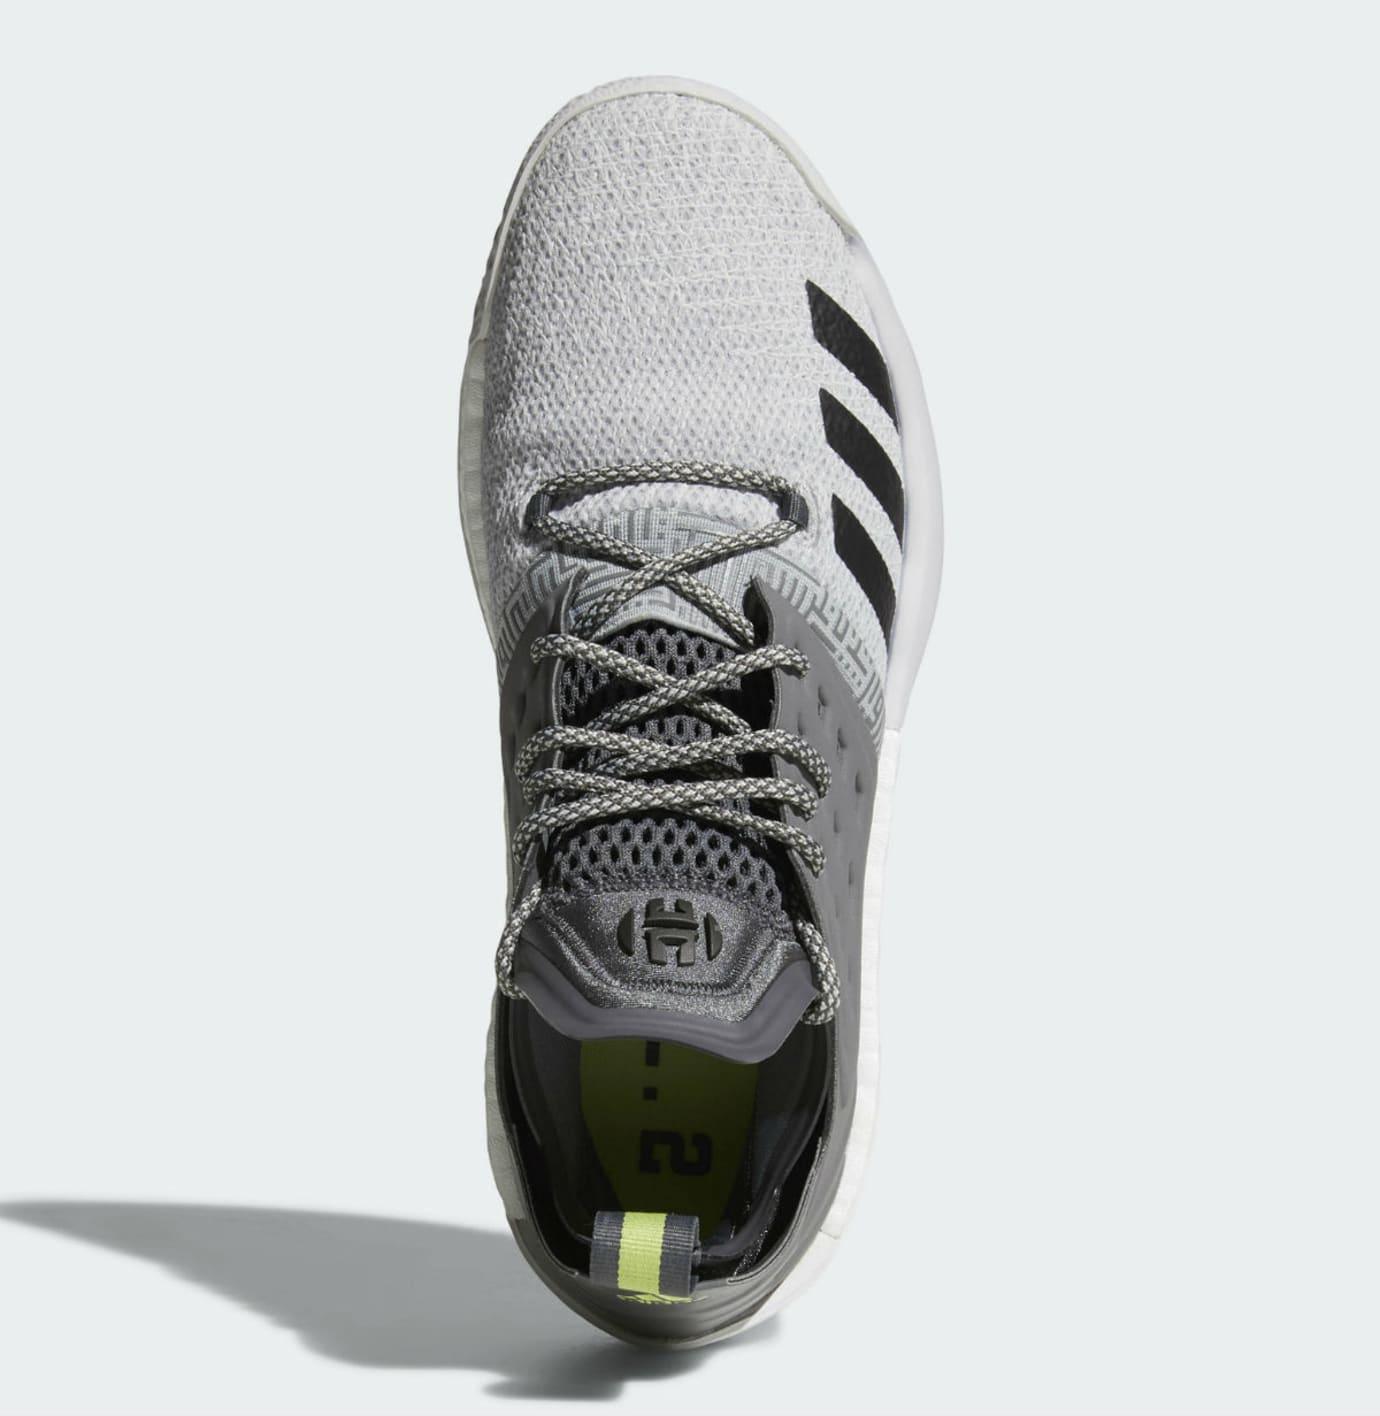 3d93186337d2 Adidas Harden Vol. 2 Concrete Grey Release Date AH2122 Top